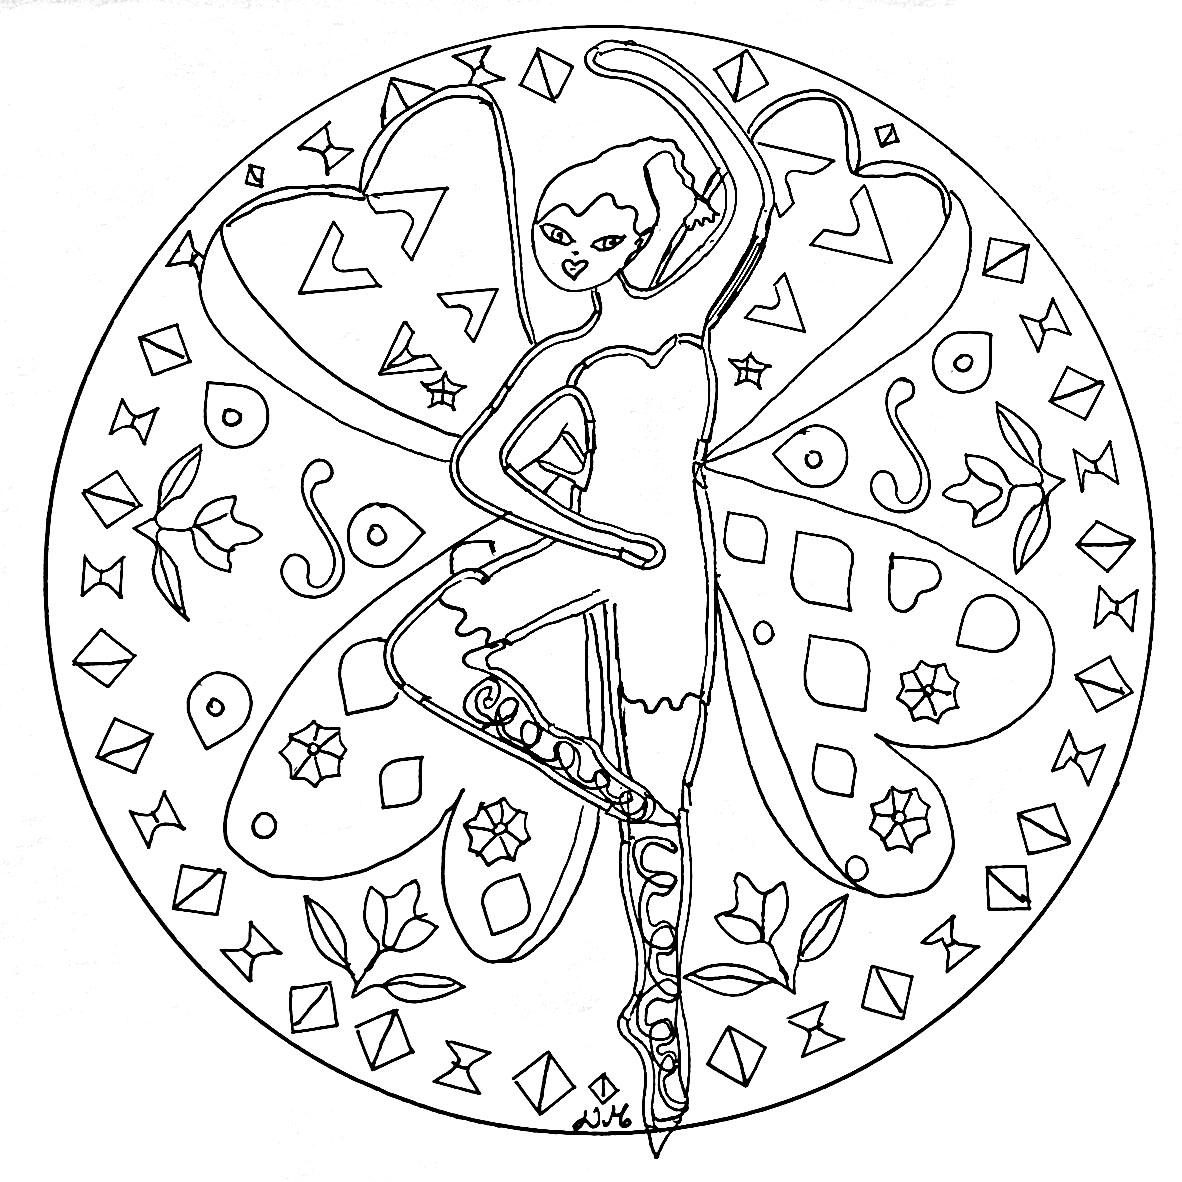 Mandala A Imprimer Fee Dansante - Simple Mandalas - 100 encequiconcerne Mandala Fée